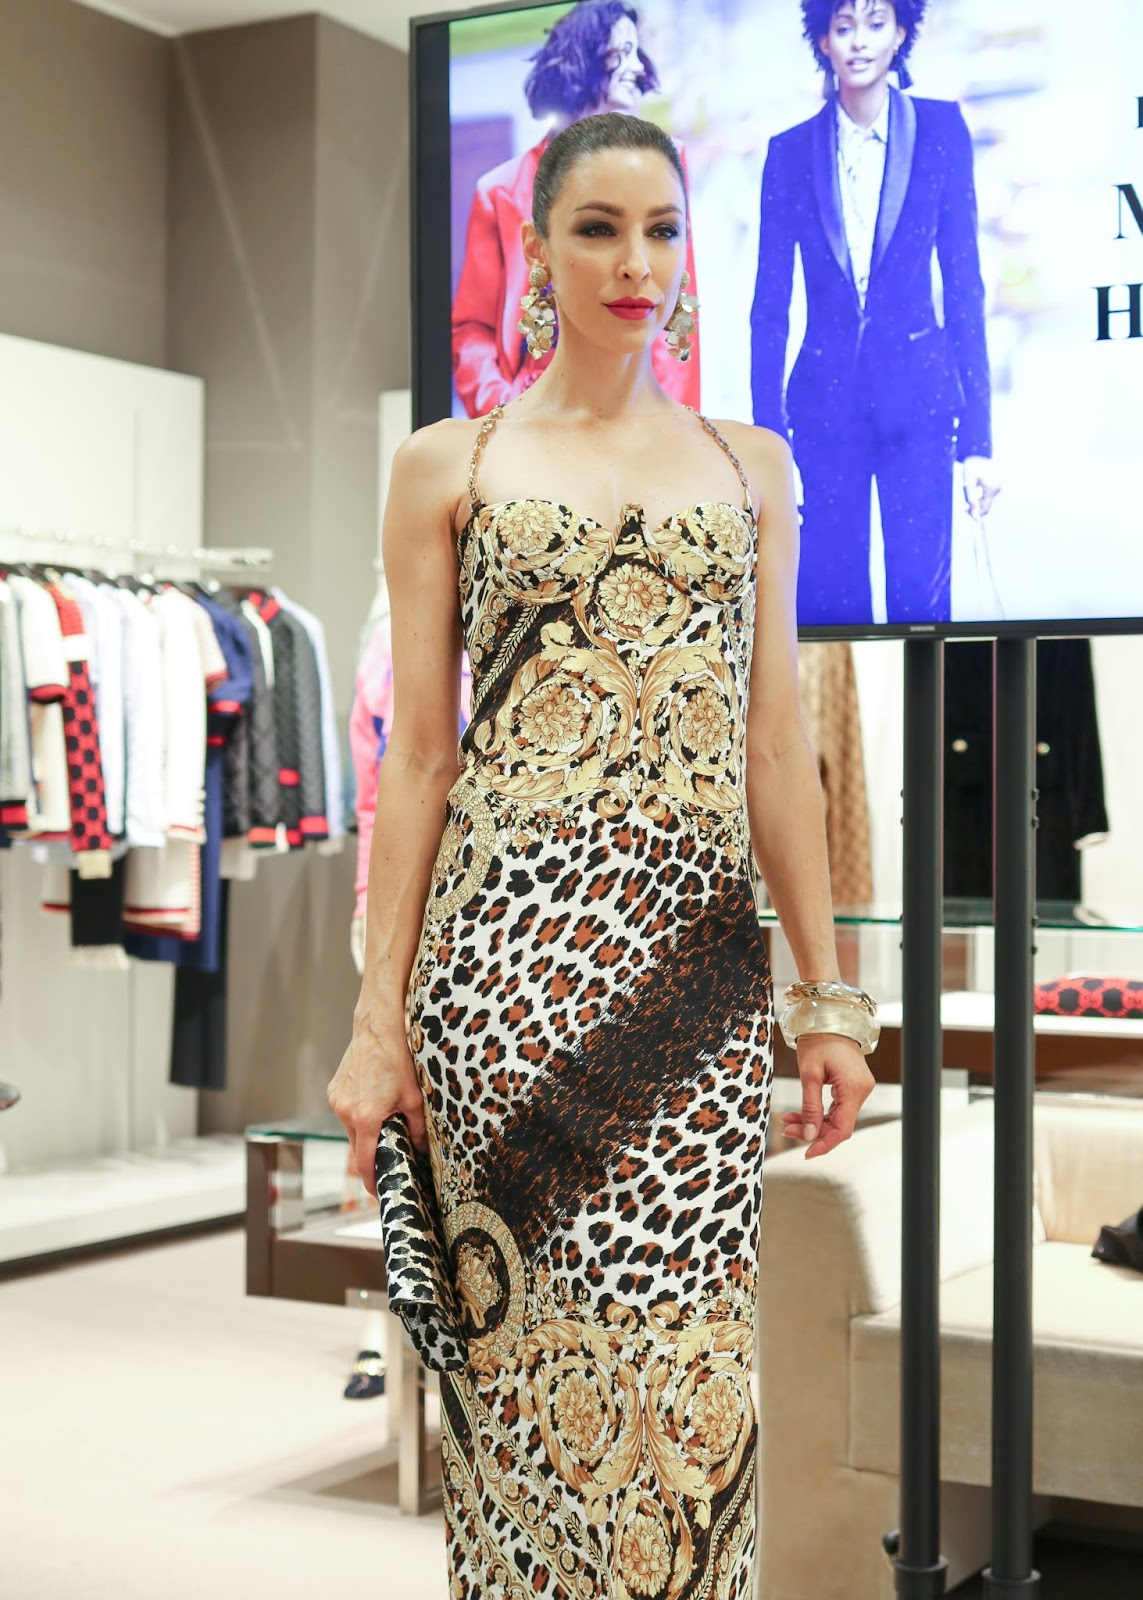 Versace Dress for fall 2018, Neiman Marcus Luncheon 2018